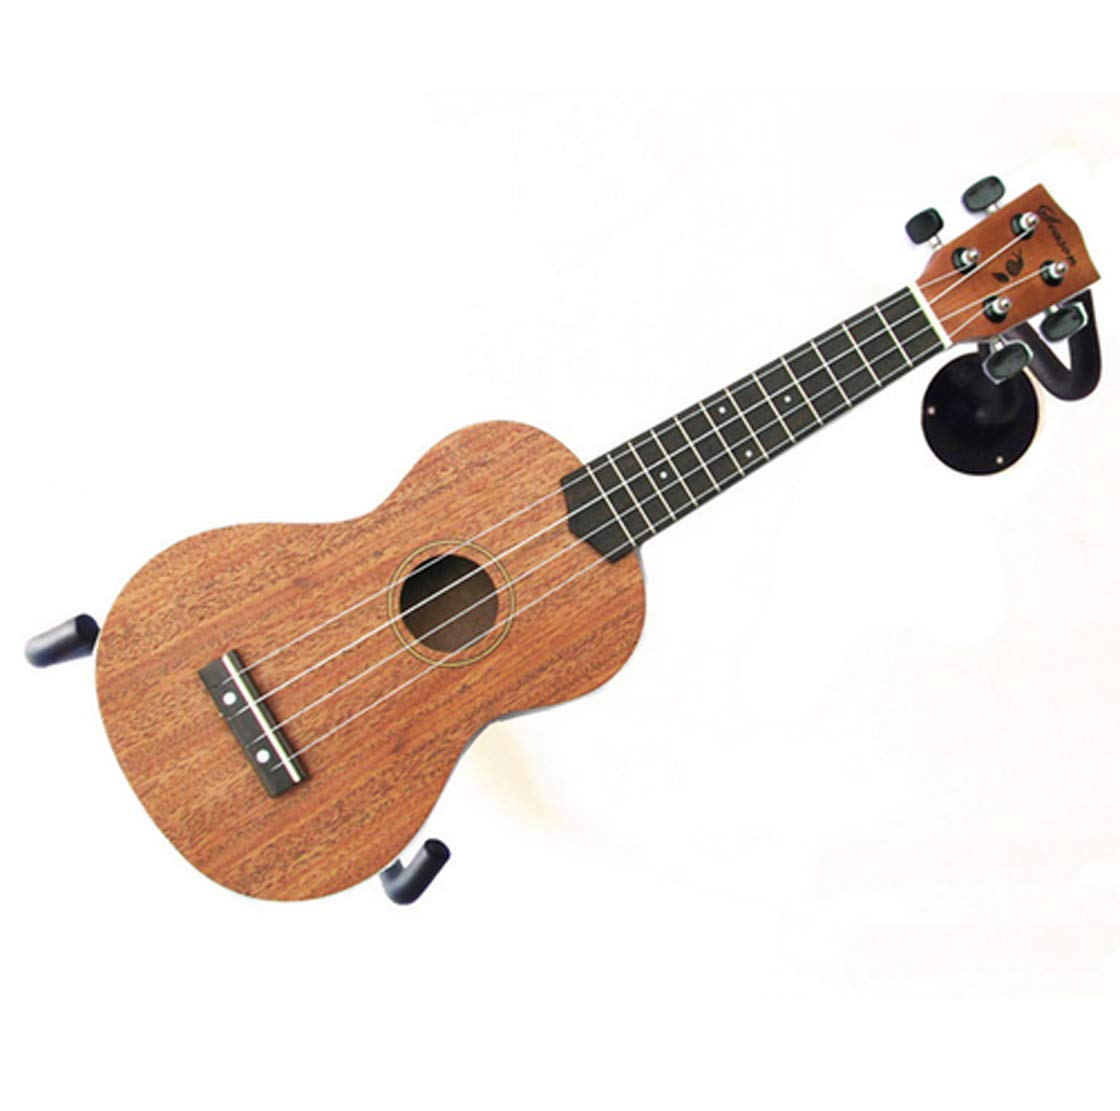 Ukulele Guitar Wall Mount Hanger Stand Slatwall Horizontal Electric Guitar Violin Wall Holder Bass Stand Rack Hook